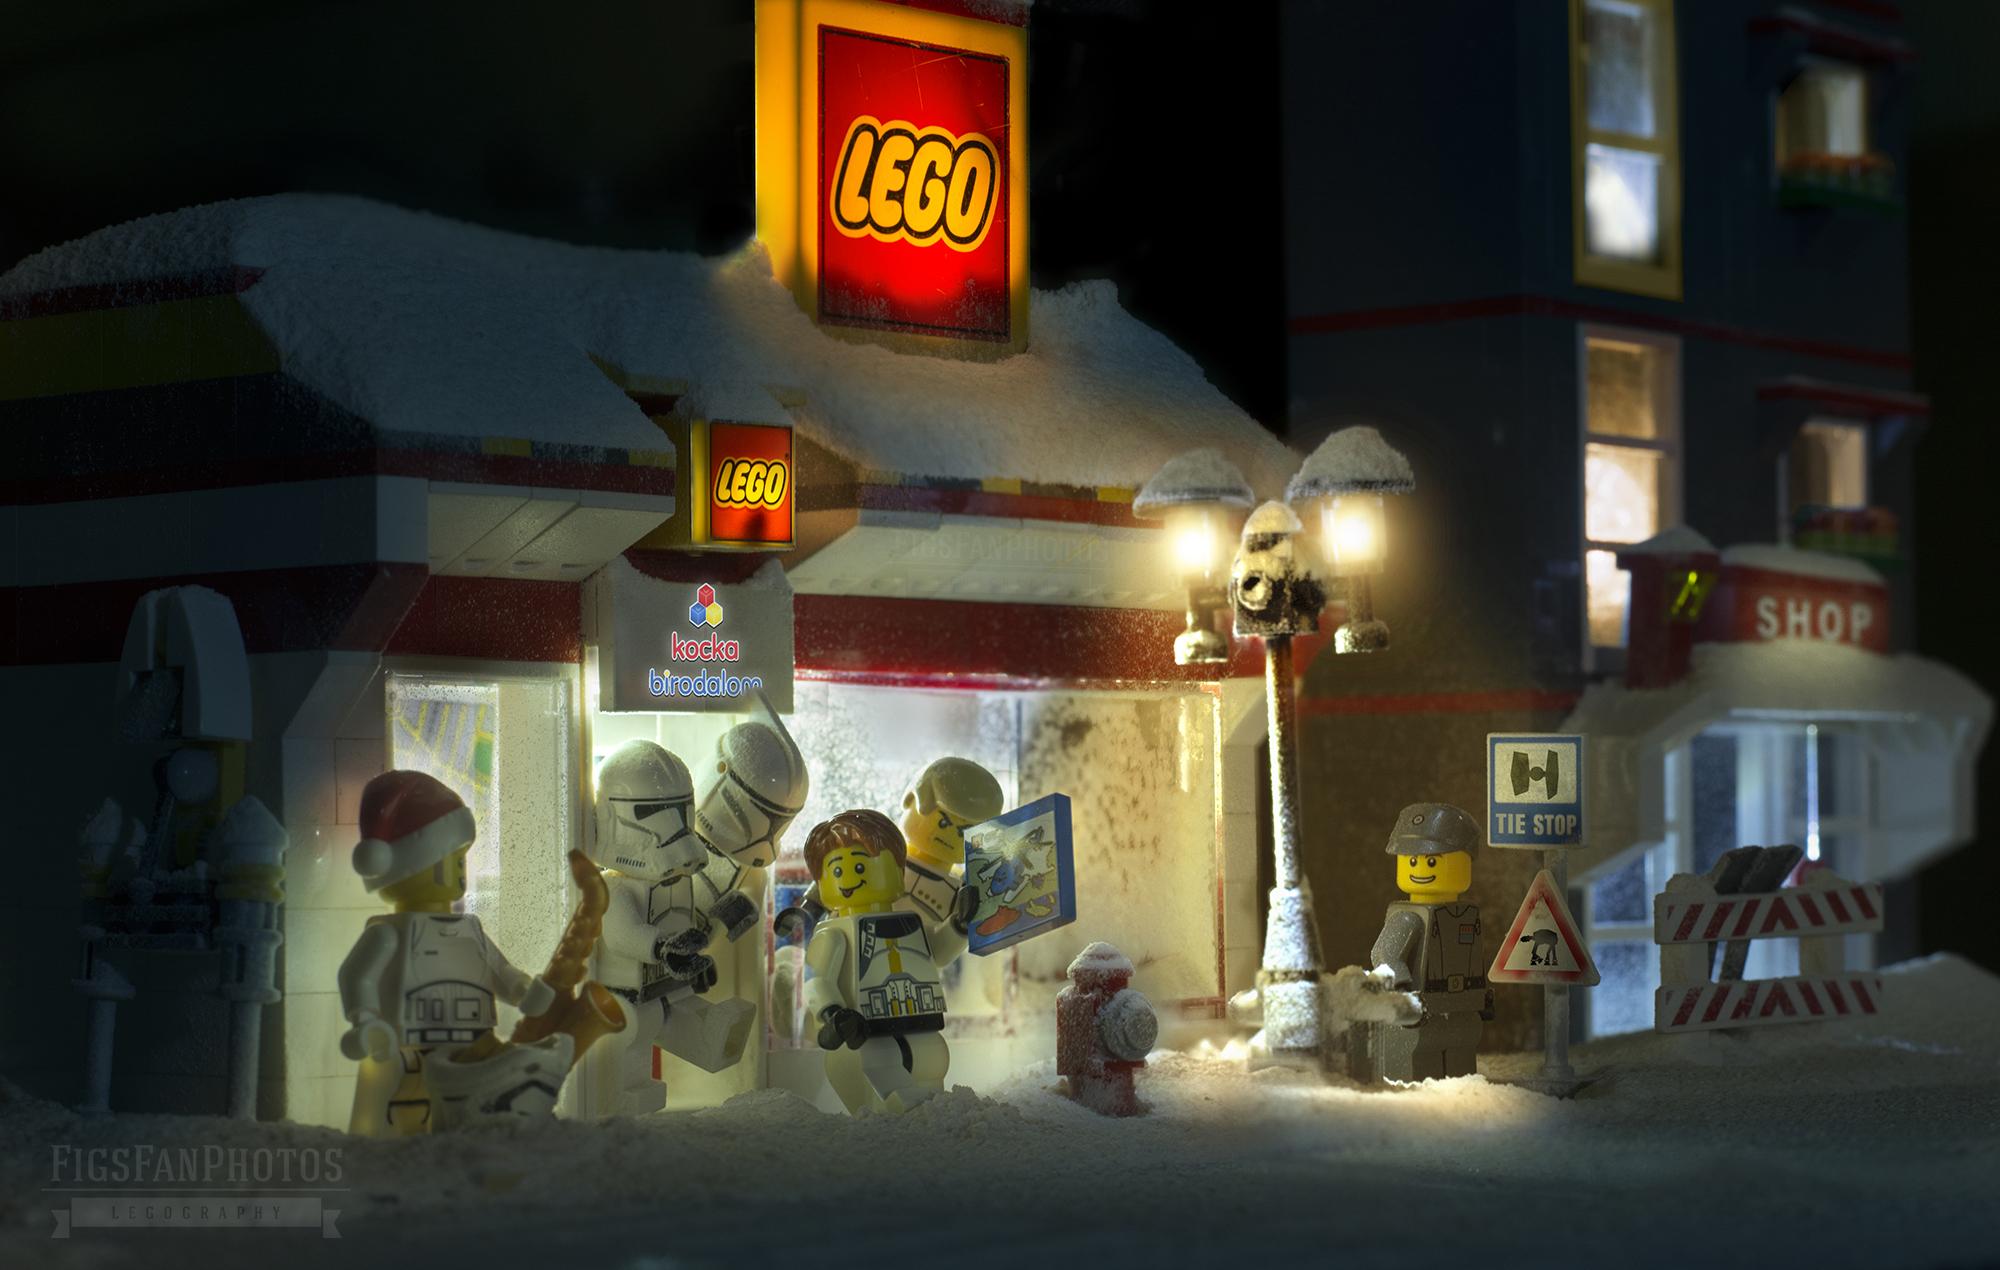 benedek_lampert_xmas_lego_store.jpg